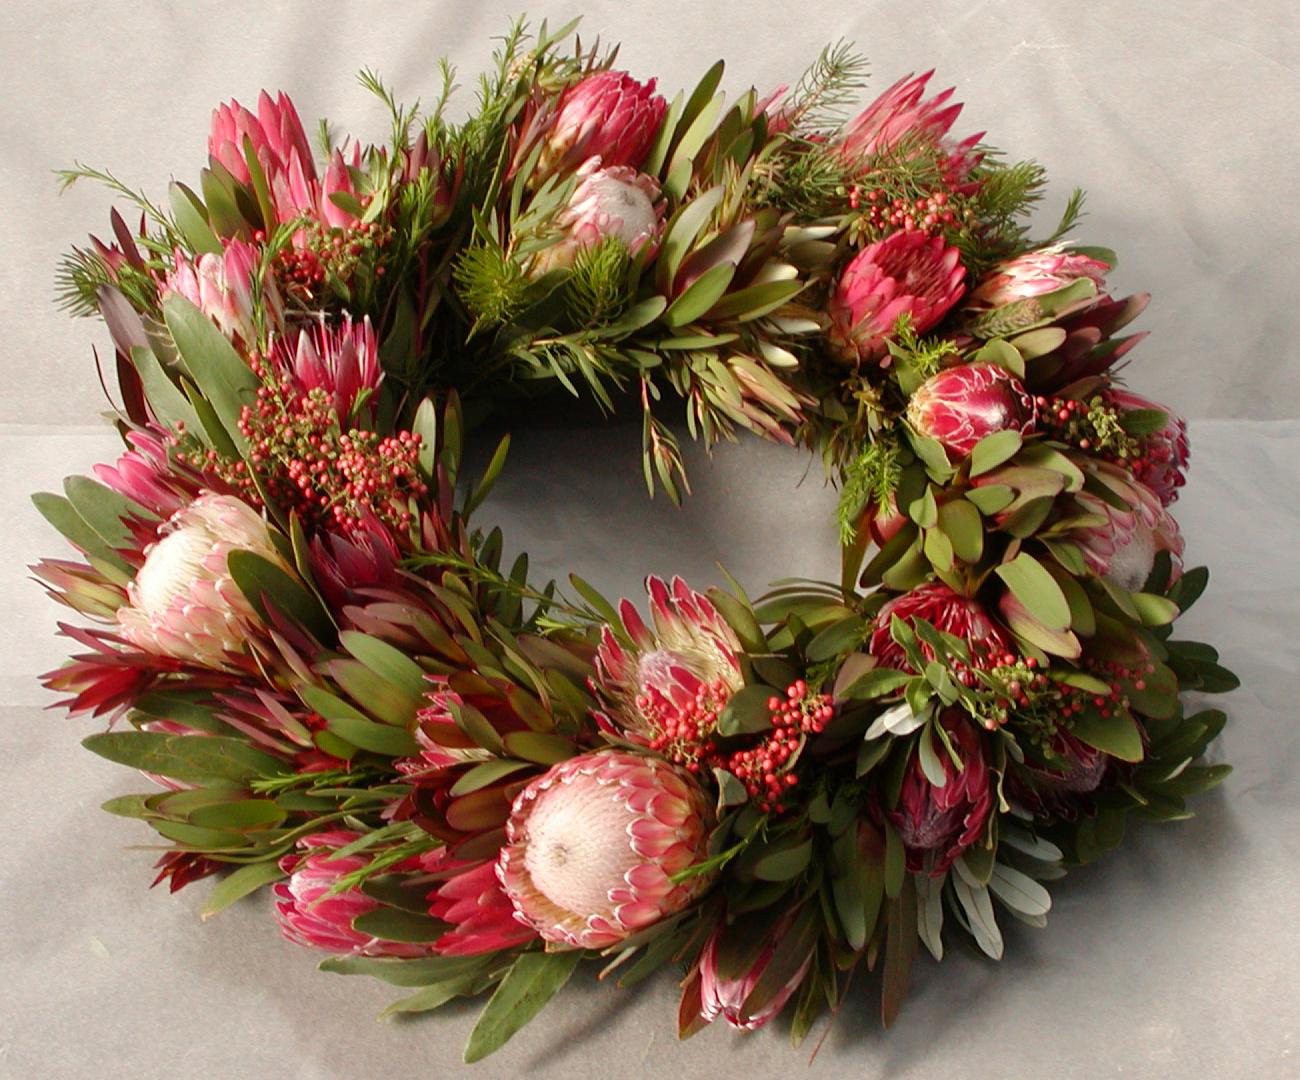 Christmas-Wreaths-See-more-beautiful-DIY-Chrsitmas-Wreath-ideas-at-DIYChristmasDecorations-net-wallpaper-wpc9003561